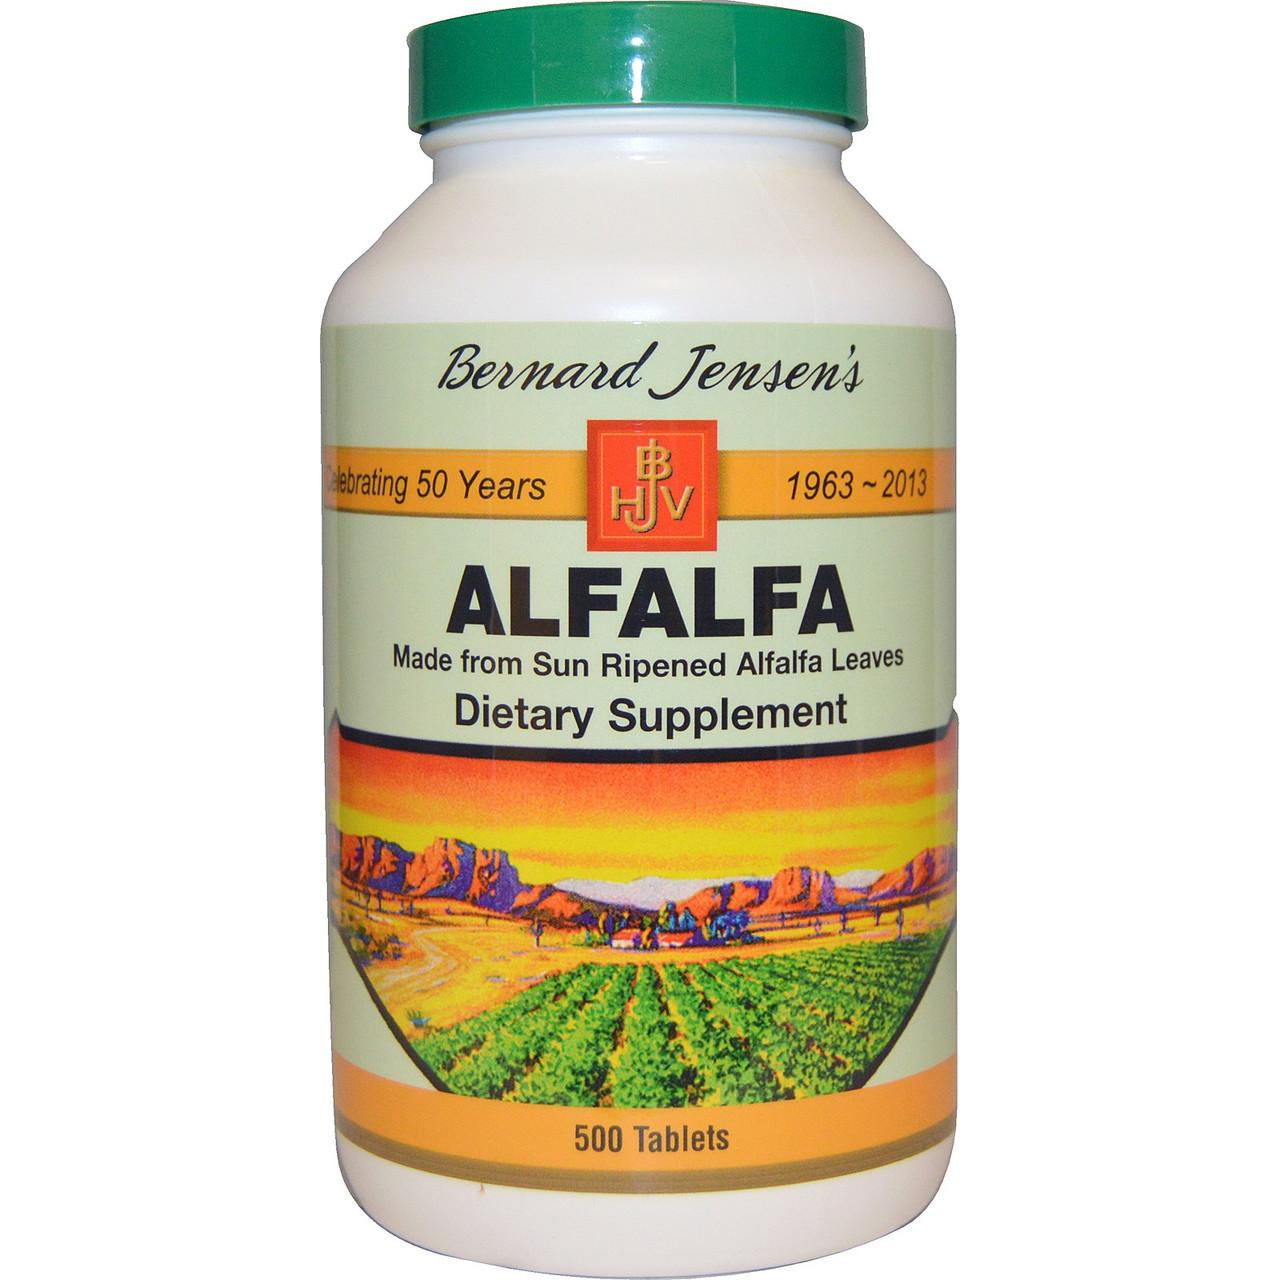 Alfalfa (Люцерна), Bernard Jensen's, 500 таблеток. Сделано в США.